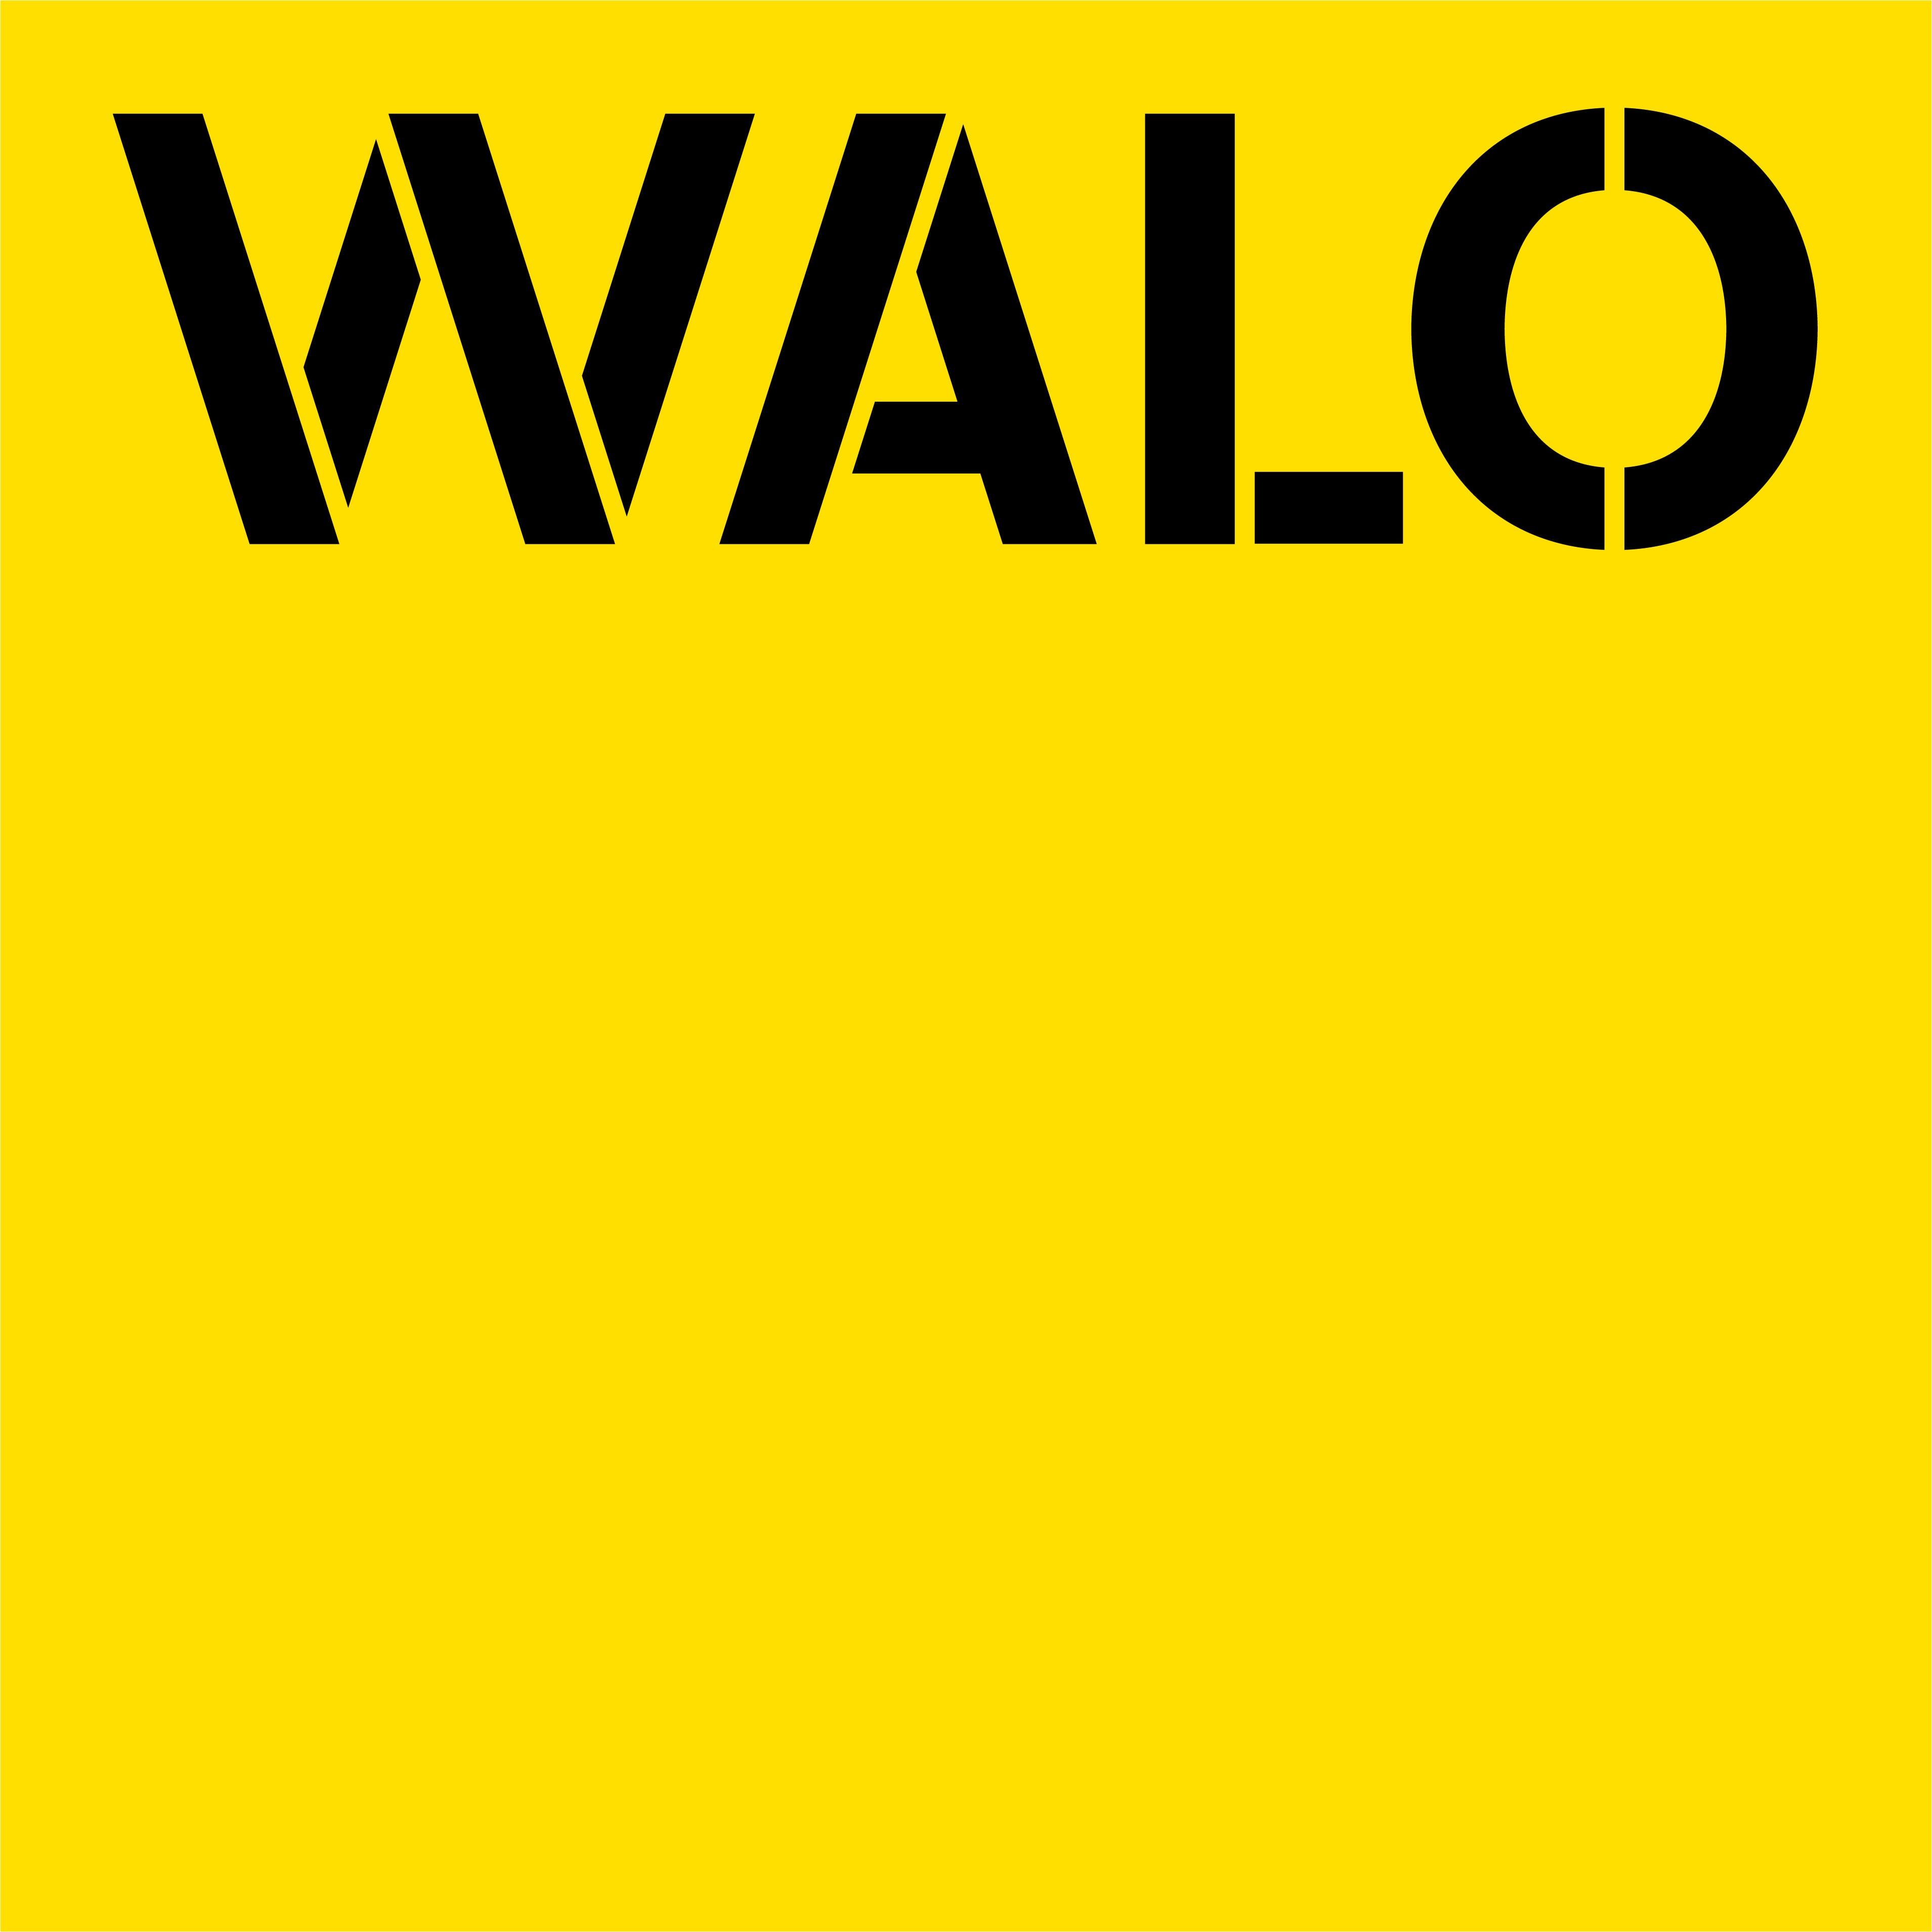 WALO login Ausbildung